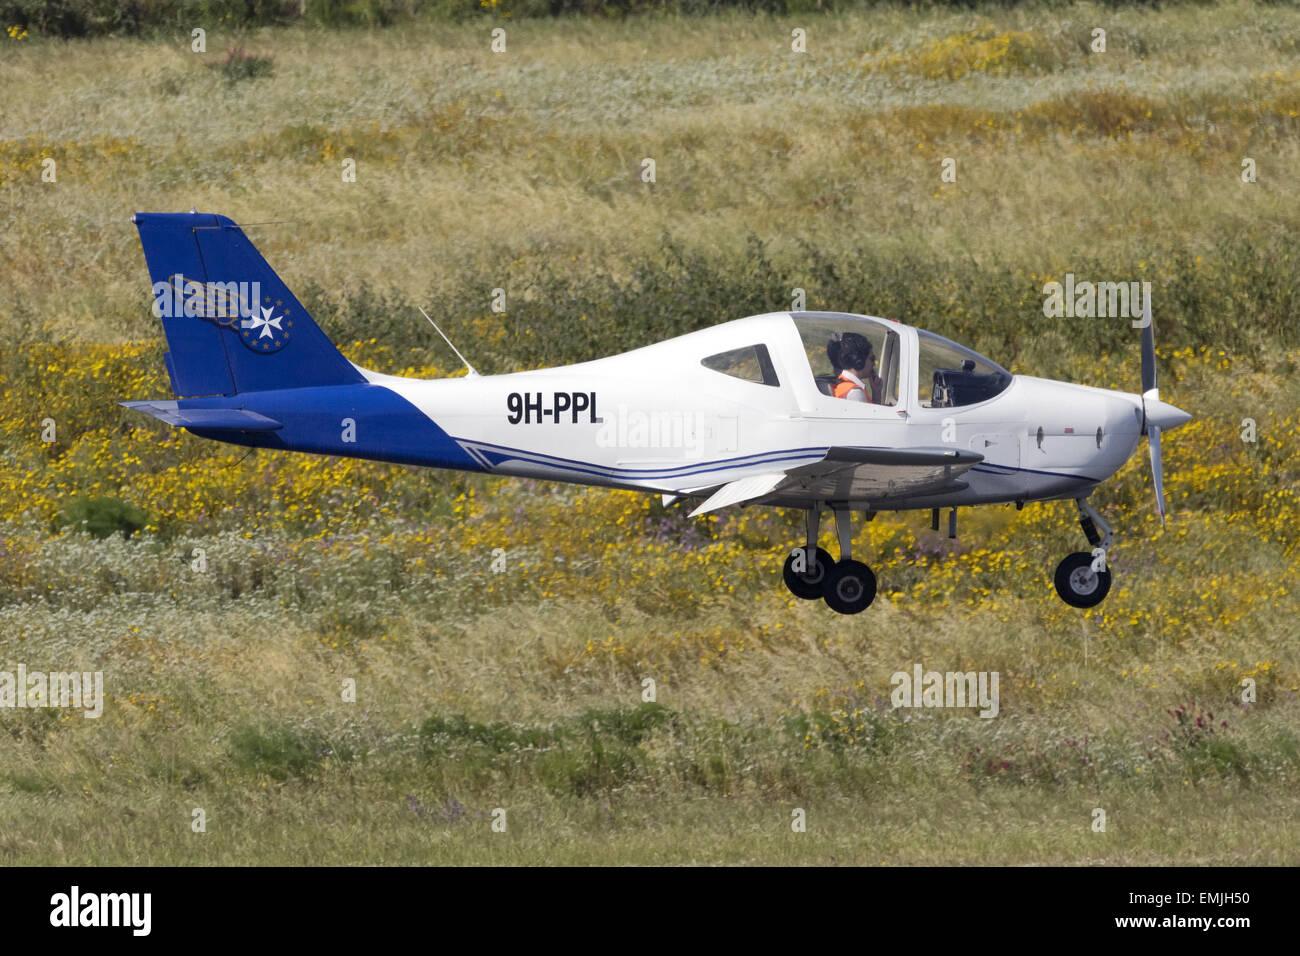 European Pilot Academy Tecnam P-2002JF Sierra, registration 9H-PPL, overflying the runway during a pilot training - Stock Image